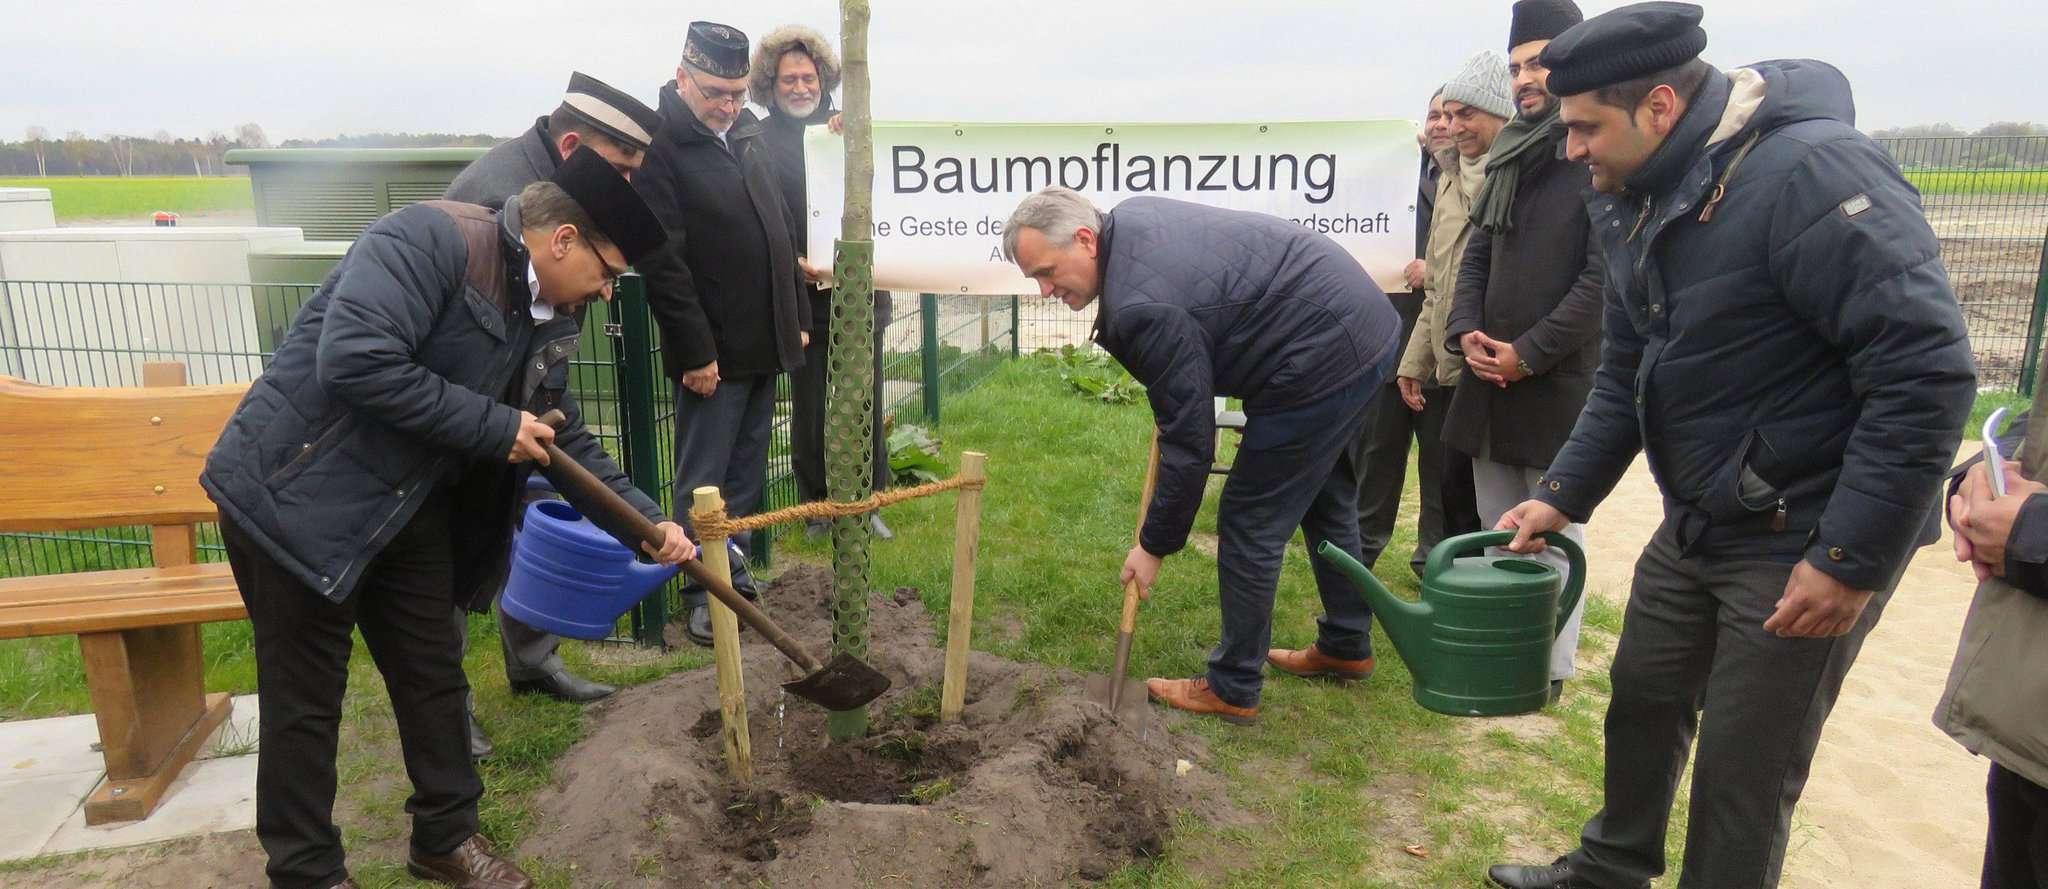 Posthausens Ortsbürgermeister Reiner Sterna (Mitte) legte bei der Pflanzung persönlich Hand an. Foto: Elke Keppler-Rosenau